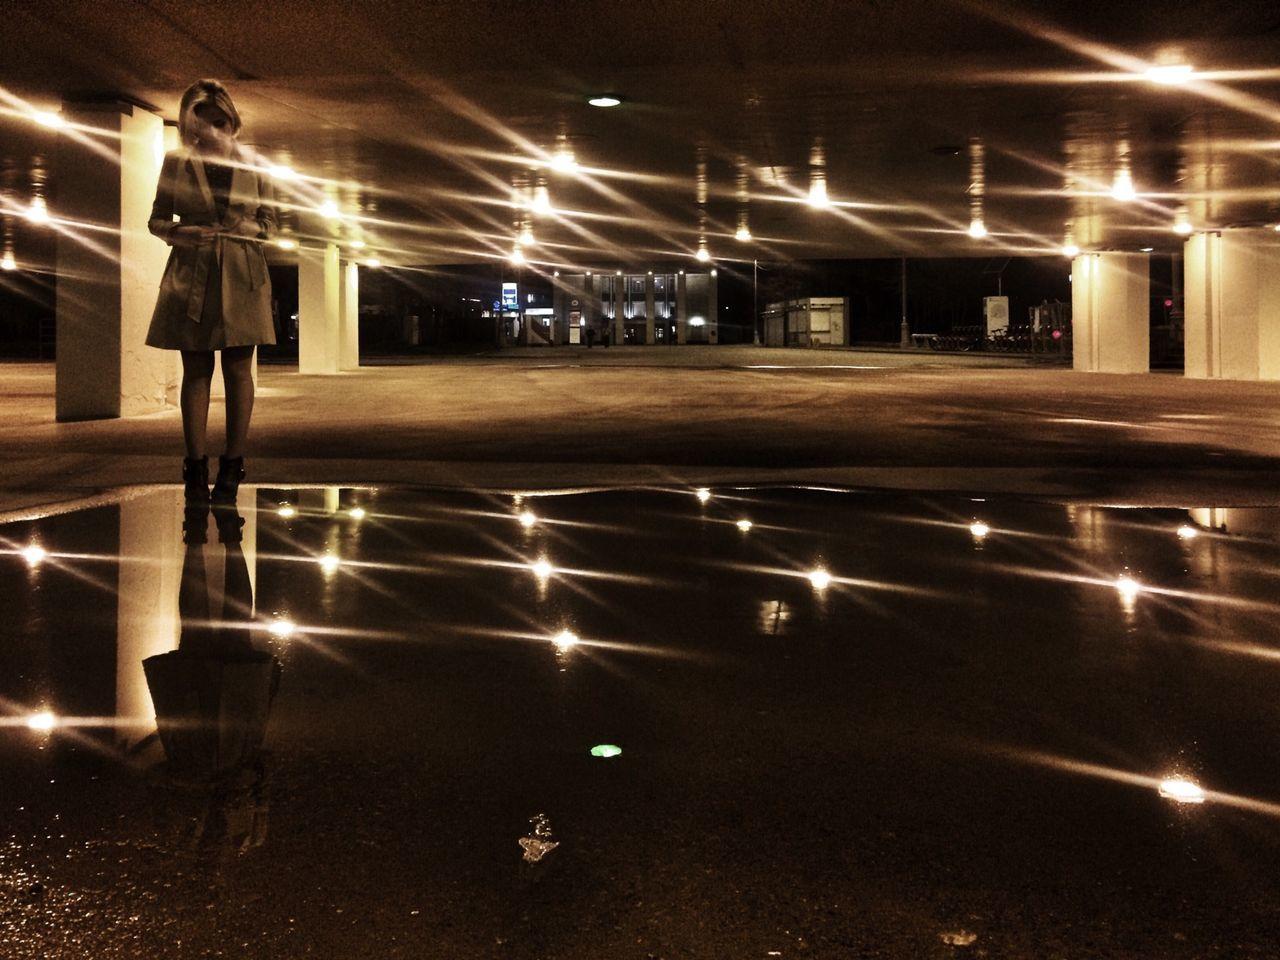 illuminated, night, transportation, lighting equipment, light beam, real people, motion, architecture, men, outdoors, people